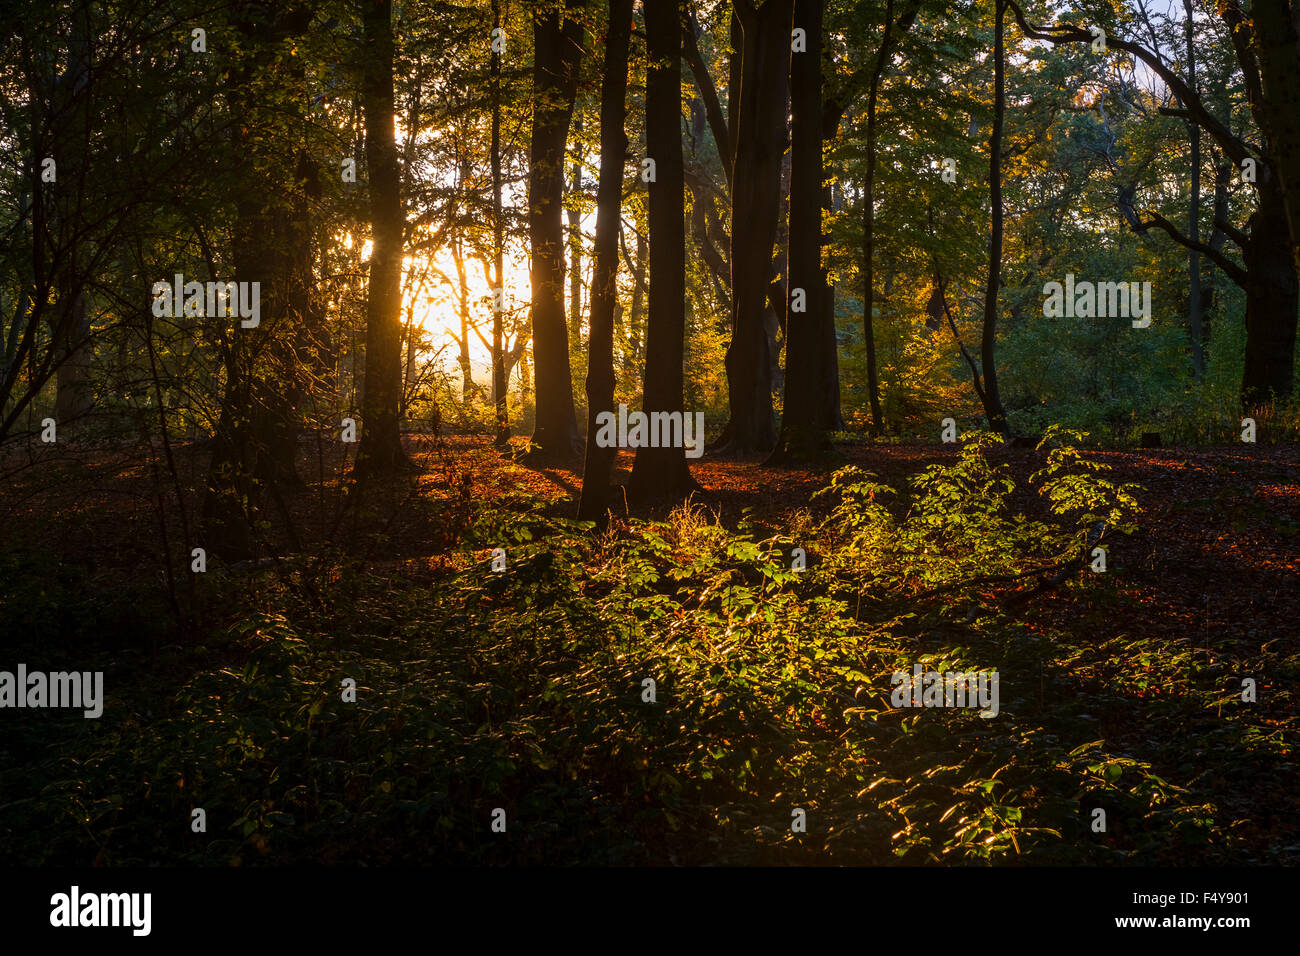 A Golden Sunset on English Woodland in Hanbury, Worcestershire. - Stock Image